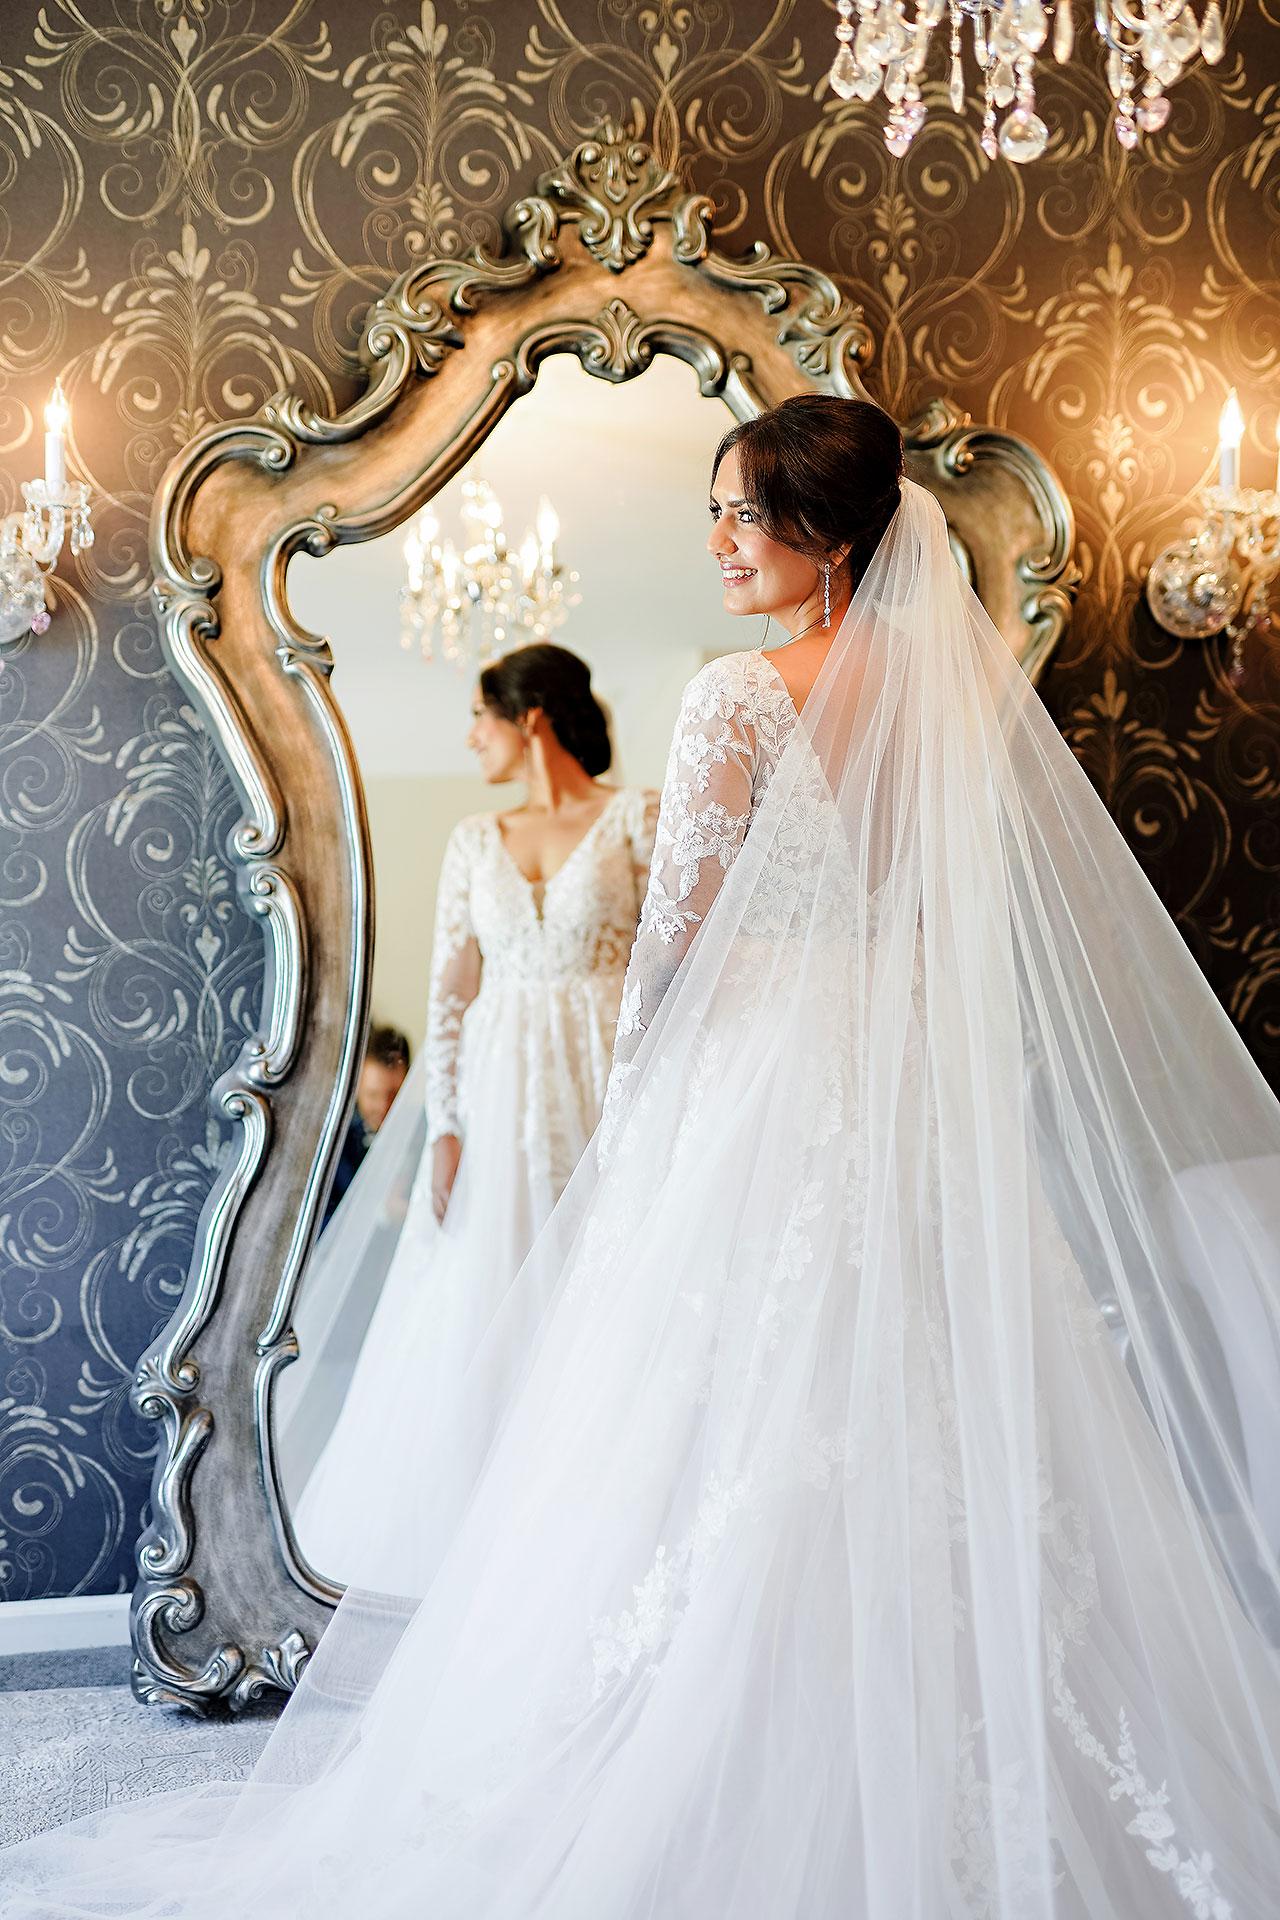 Nadia Parker Black Iris Estate Carmel Indiana Wedding May 2021 034